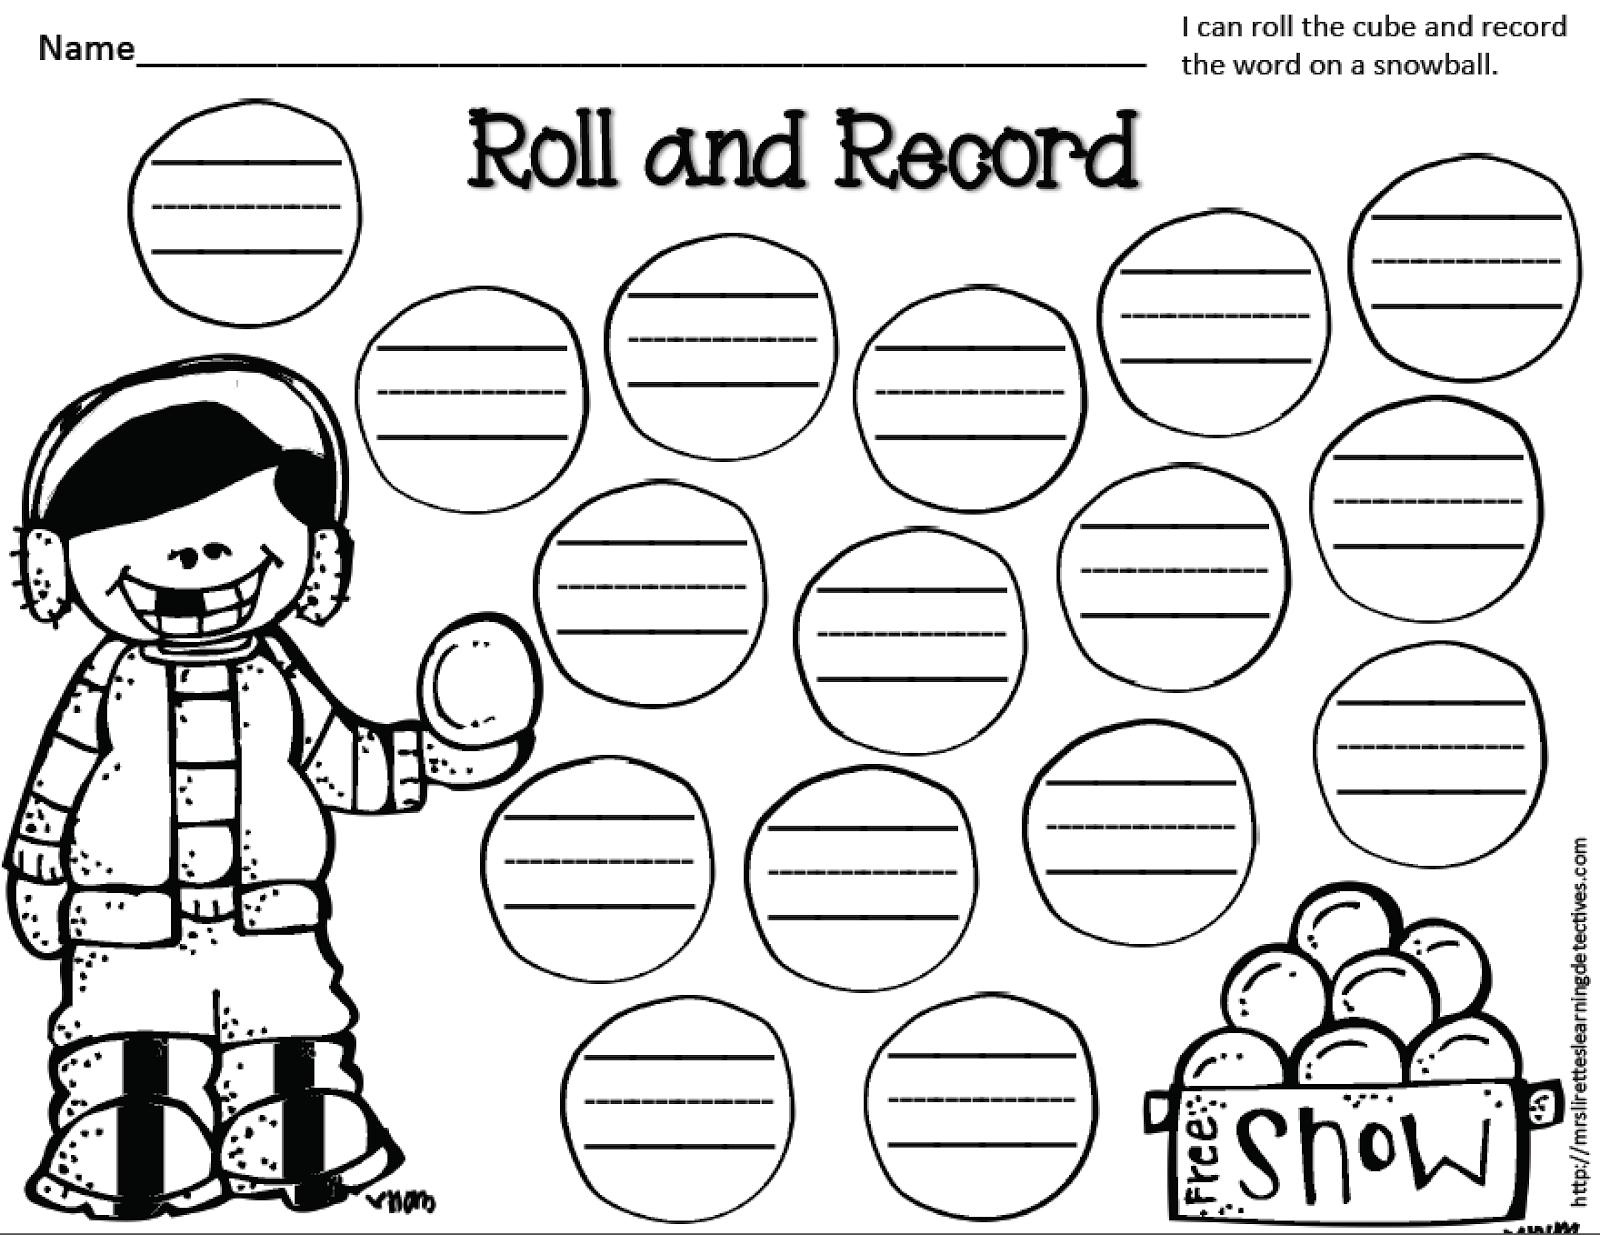 http://www.teacherspayteachers.com/Product/Winter-Roll-and-Record-FREE-1652513